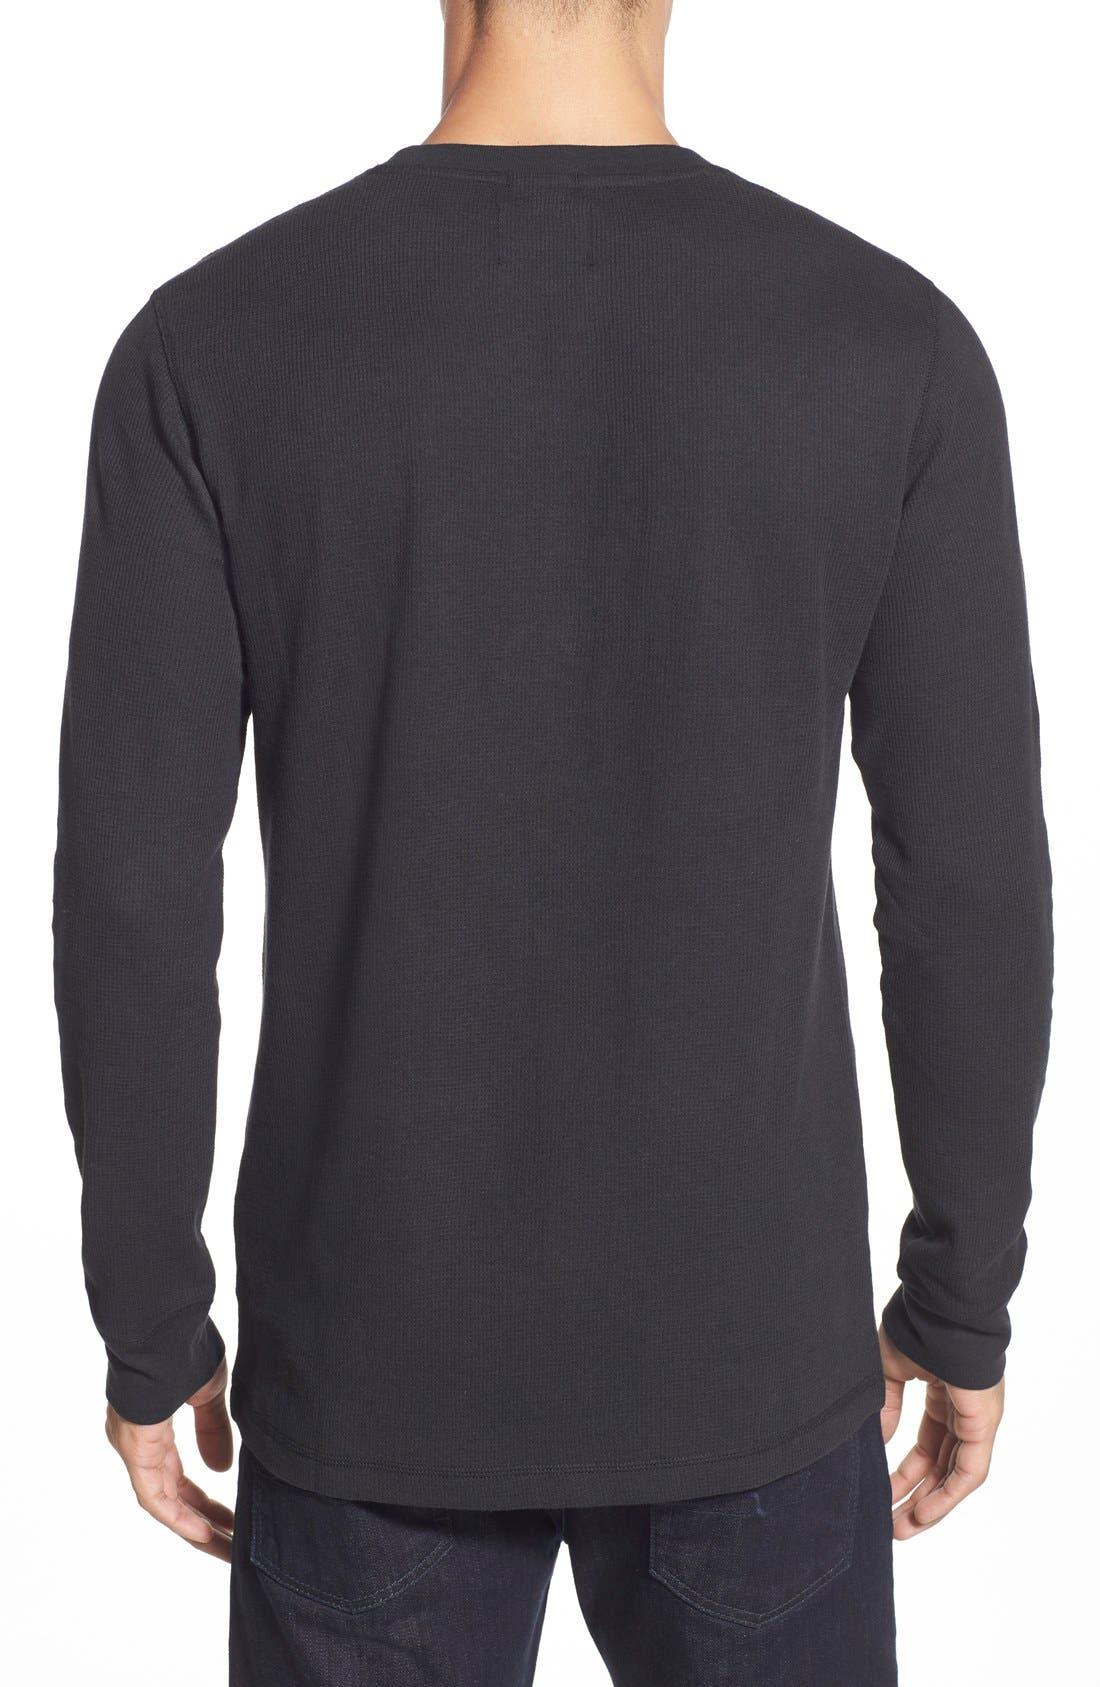 Alternate Image 2  - Nordstrom Men's Shop Waffle Knit Long Sleeve T-Shirt